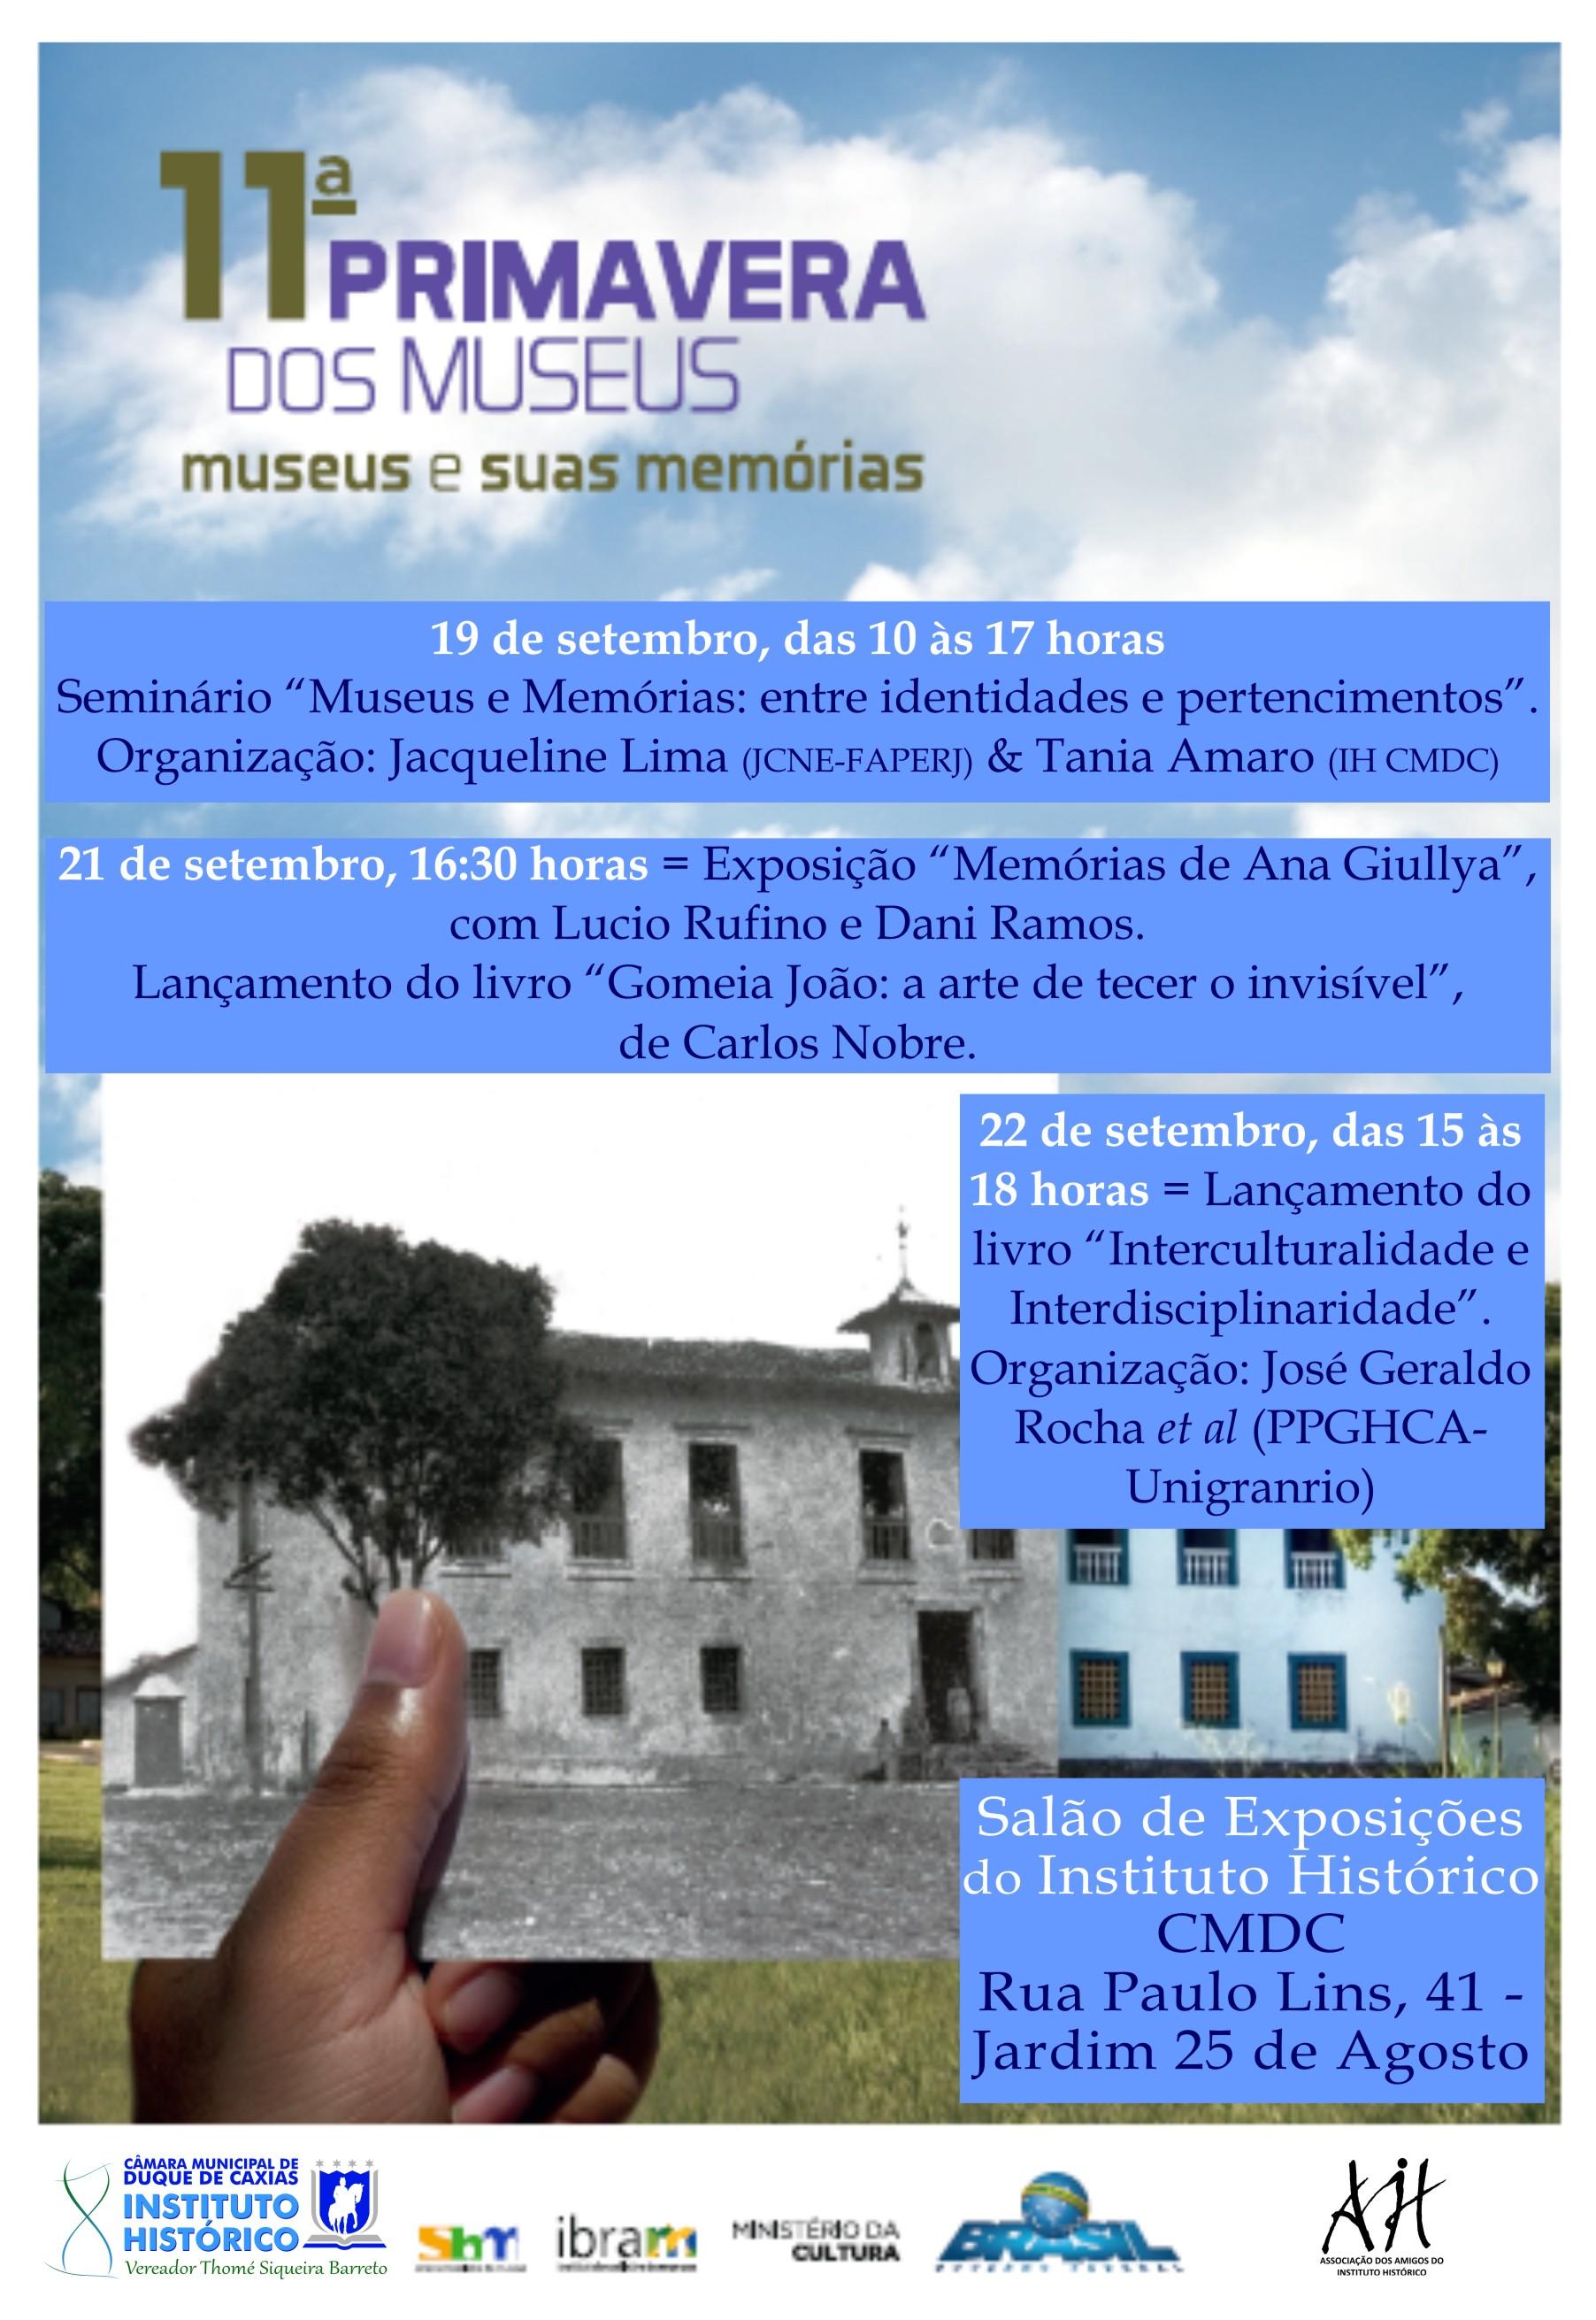 Cartaz Primavera Museus 2017